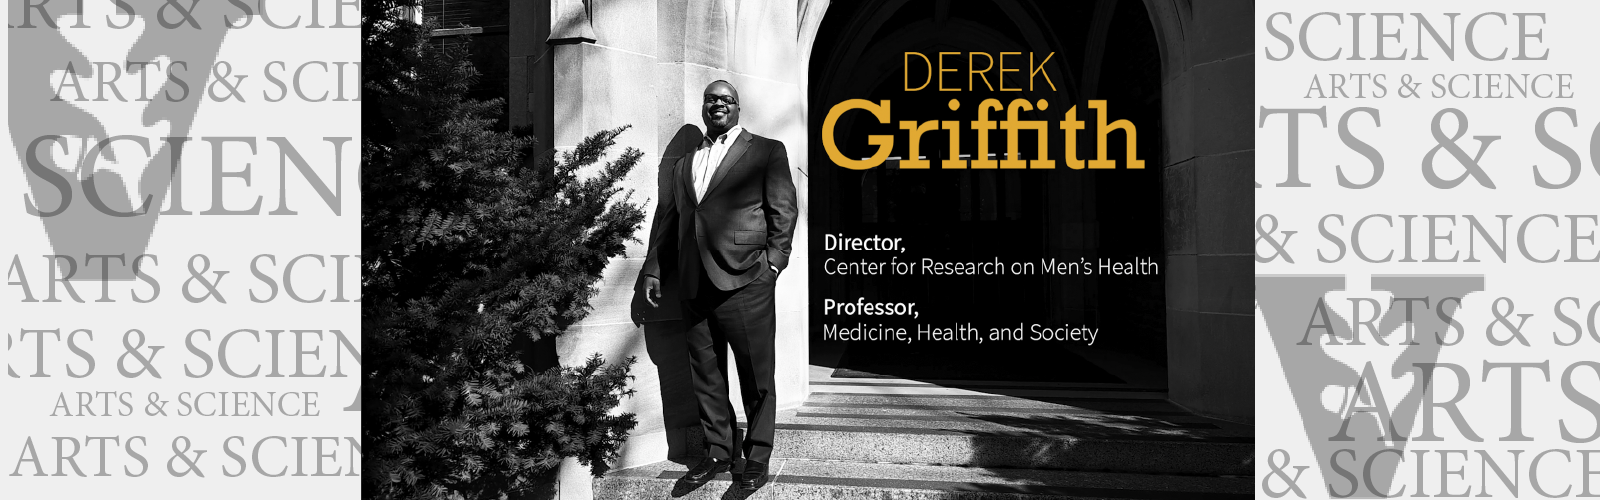 Derek Griffith | Seeing men's health through a new lens